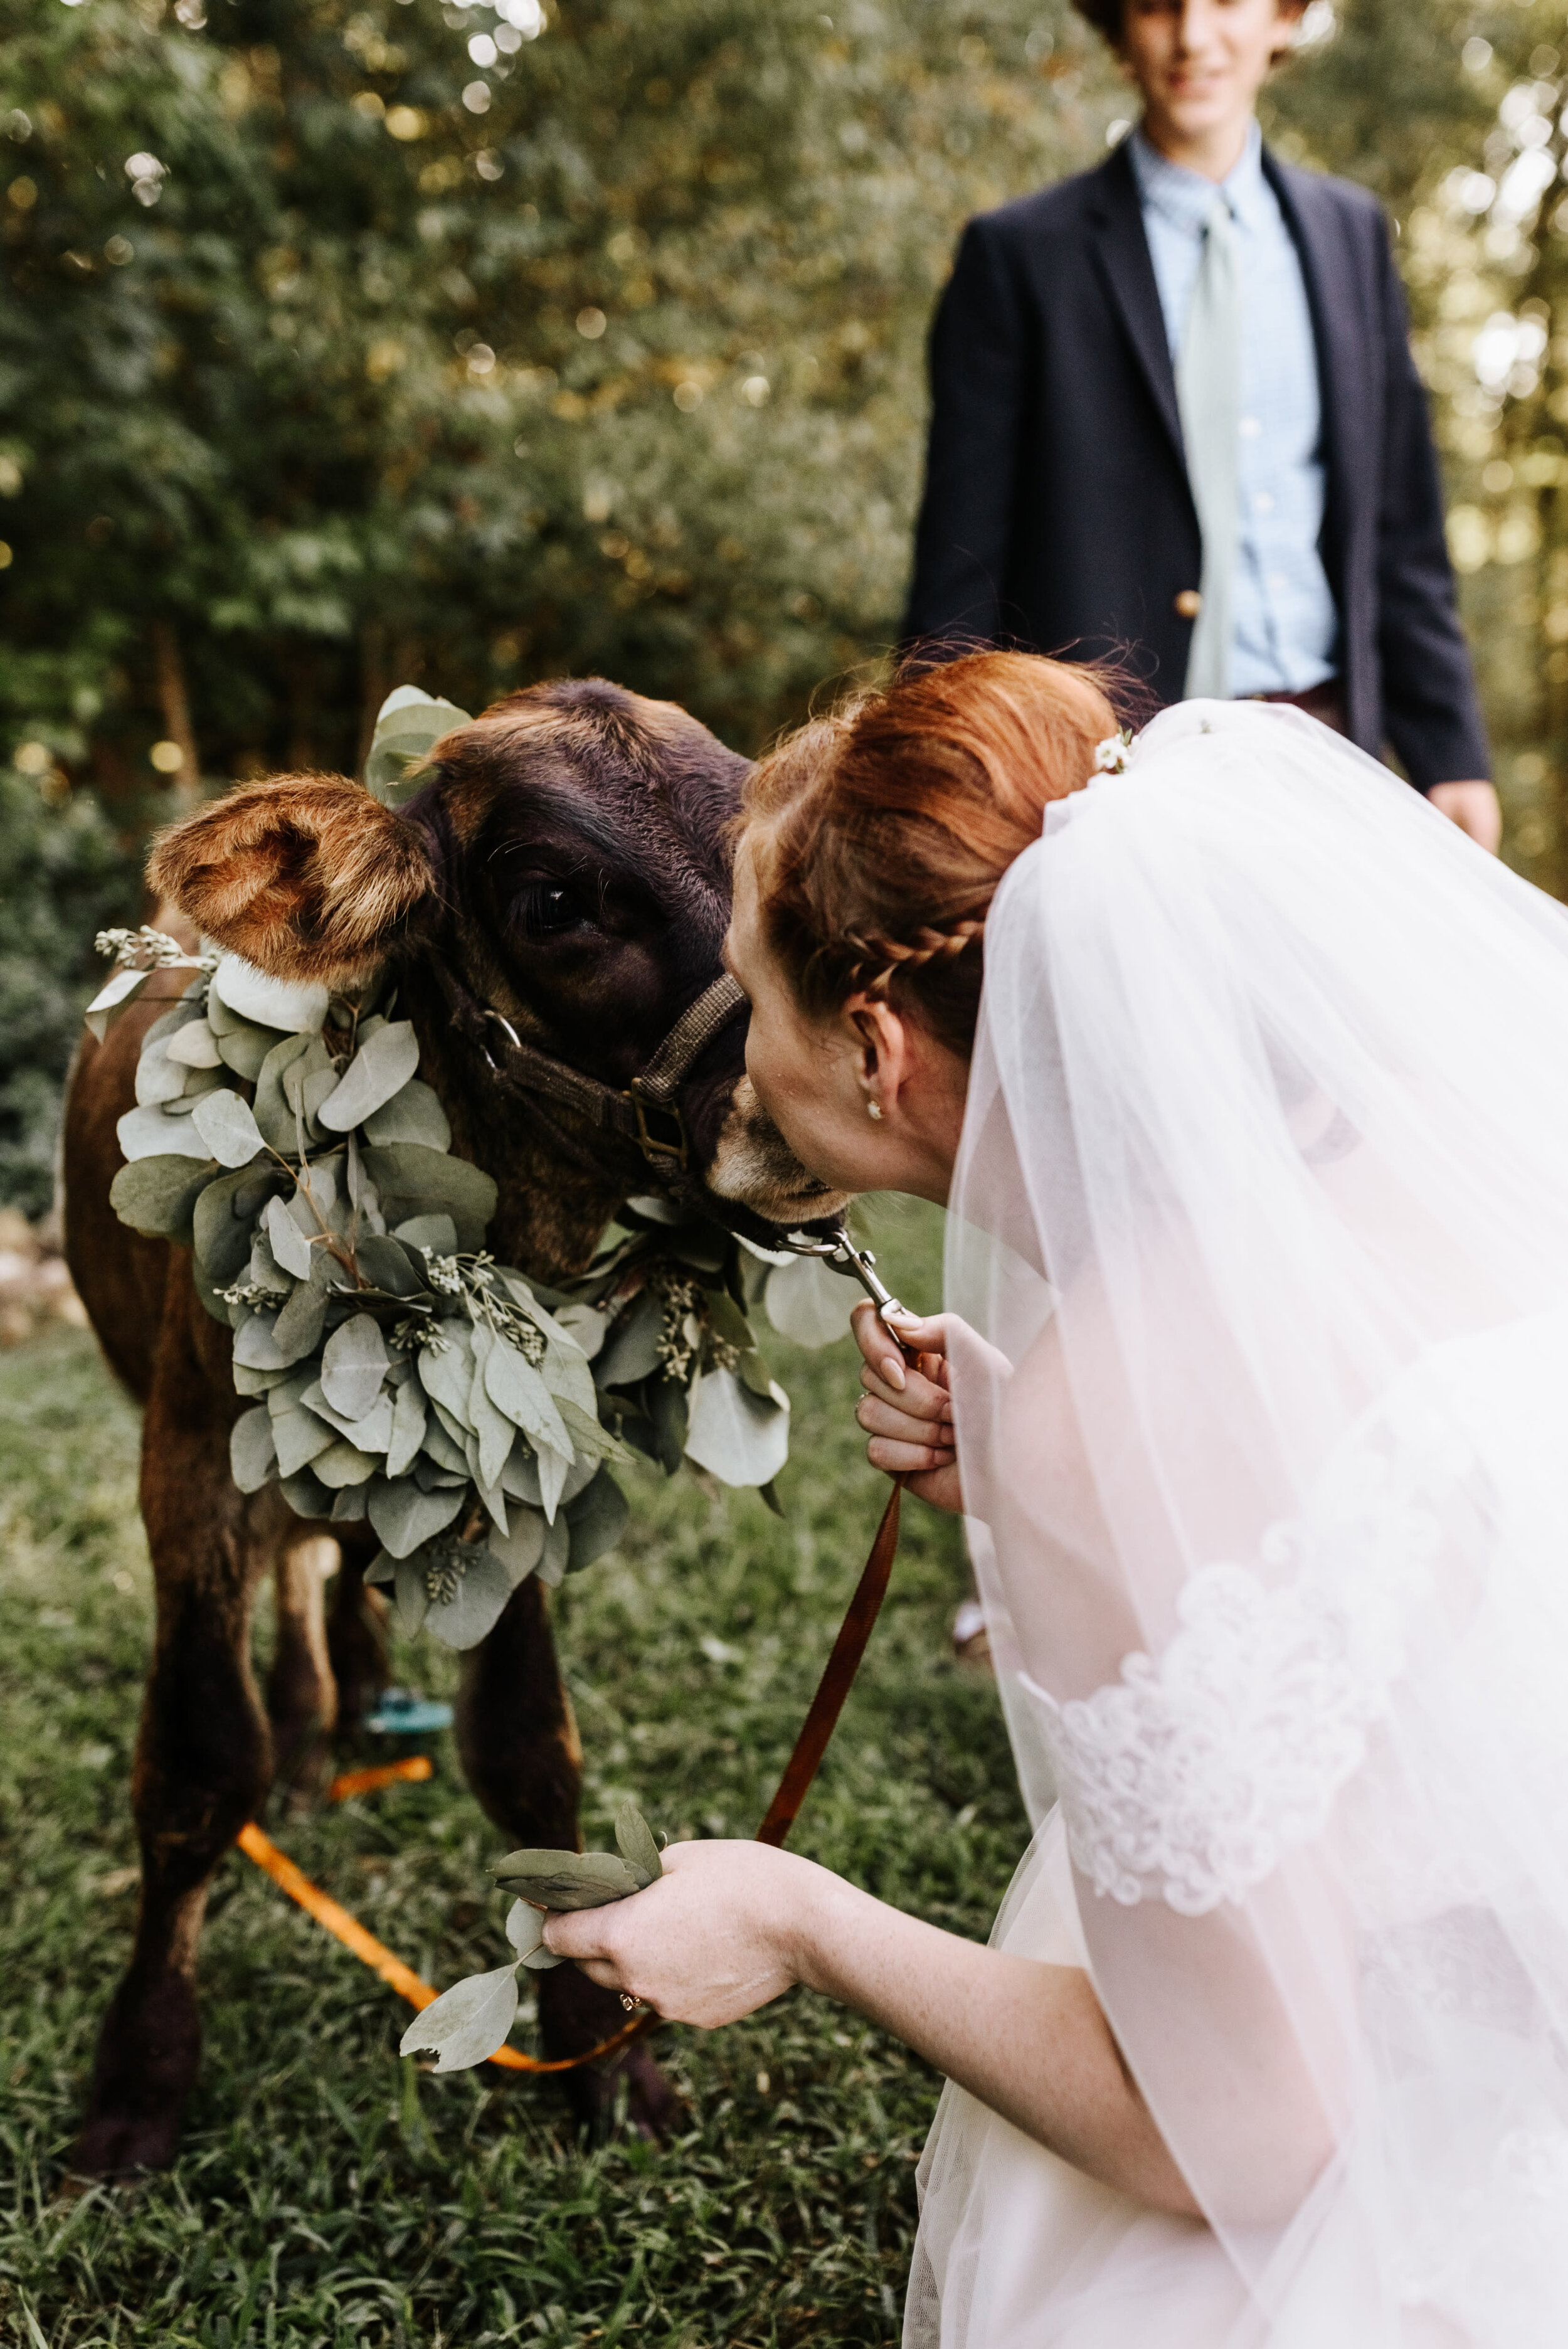 Rachel_David_Wedding_Richmond_Virginia_Photography_by_V_34.jpg